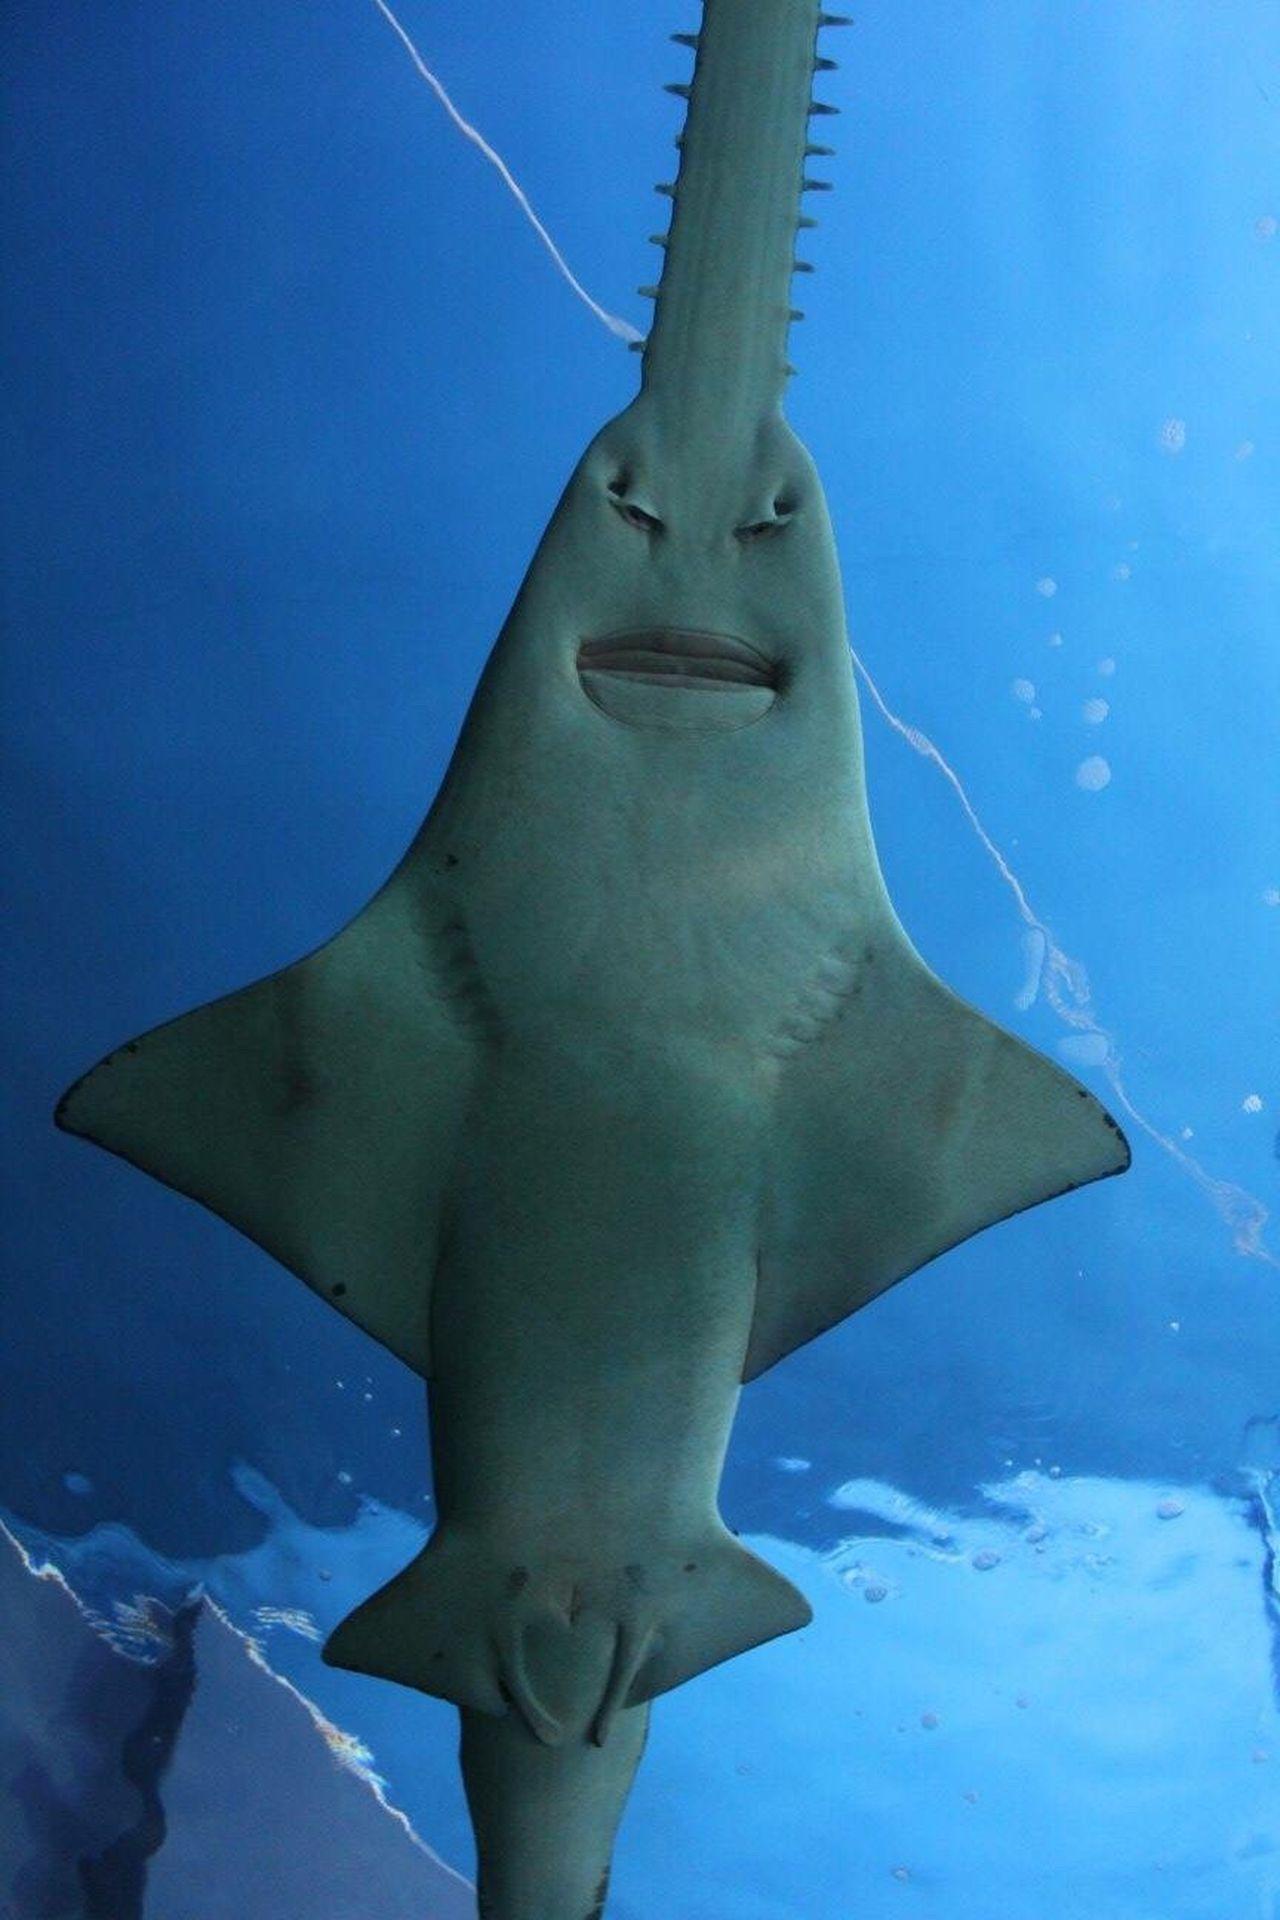 Sawfish Shark at the aquarium in Sydney, Australia Blue Underwater Animal Themes Nature One Animal Shark Sawfish Sea Life UnderSea